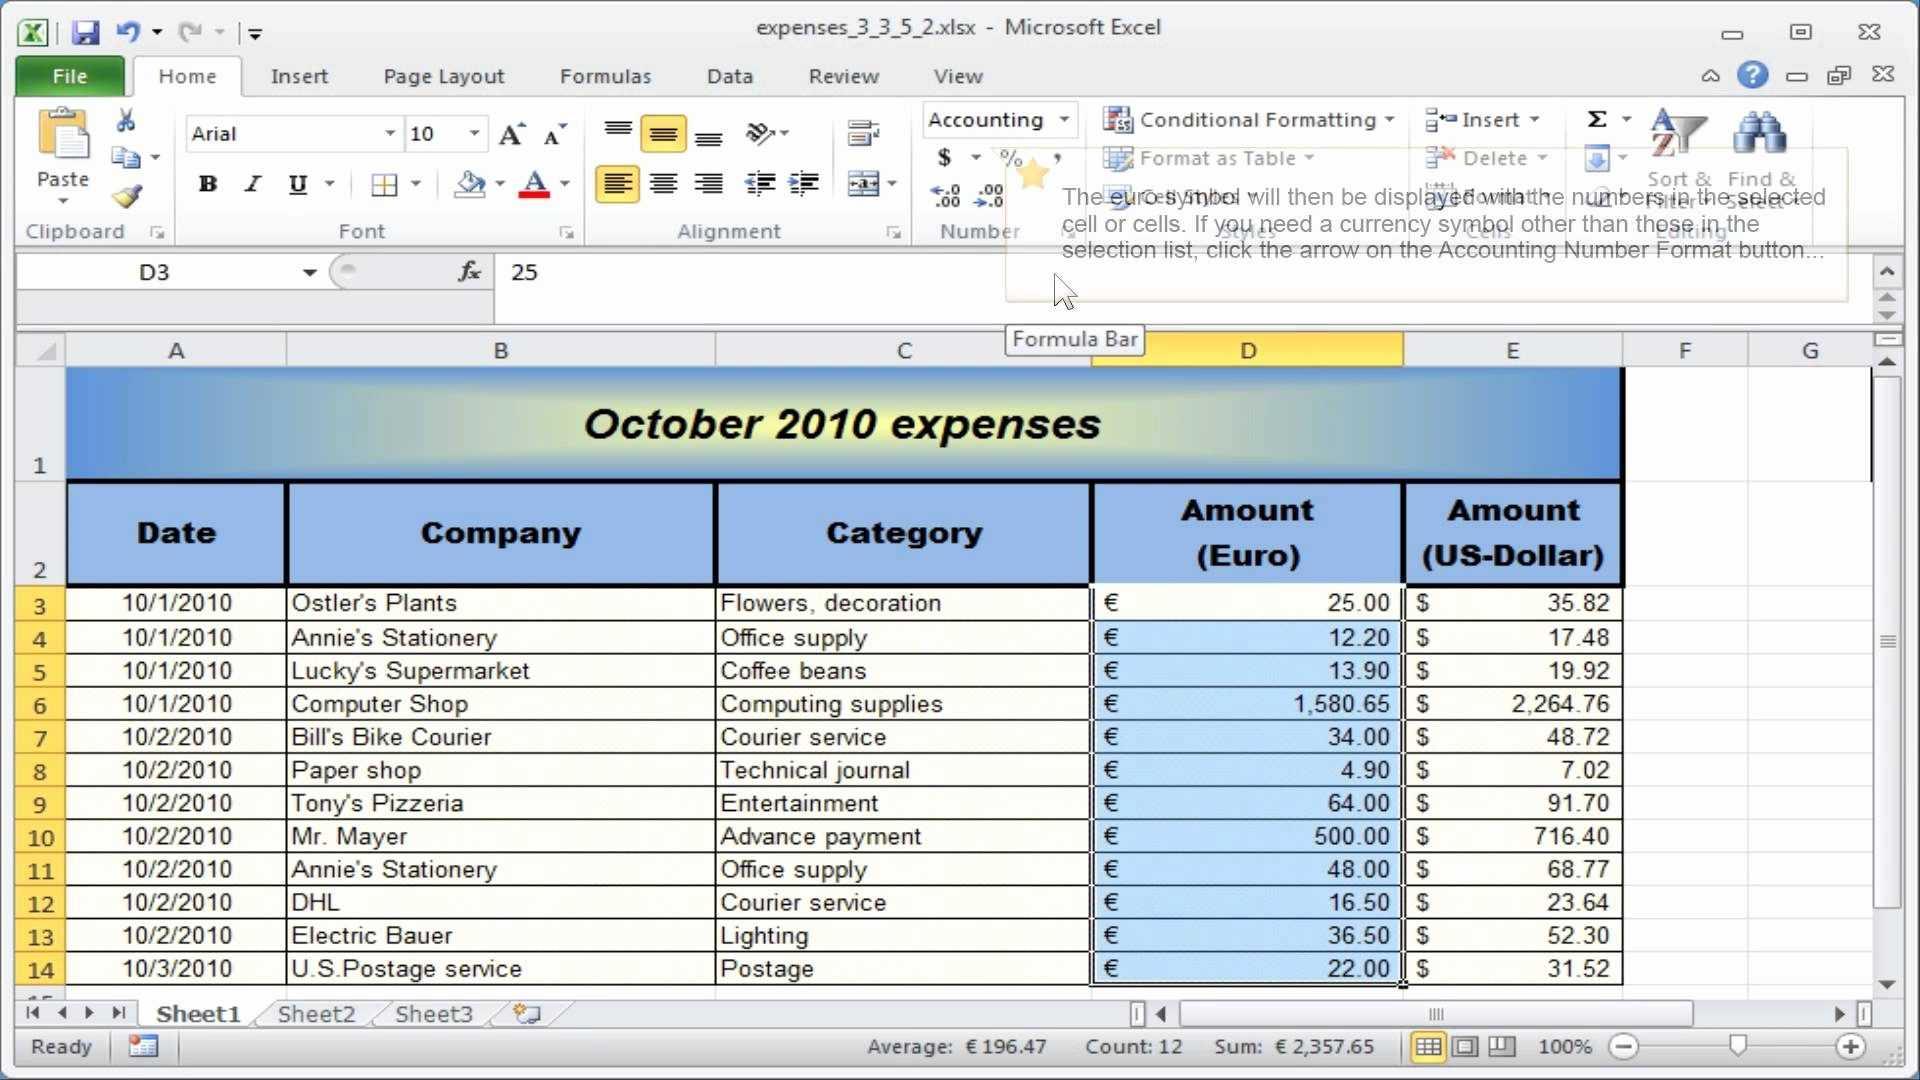 Free Retirement Calculator Excel Spreadsheet With Regard To 15 New Retirement Calculator Excel Spreadsheet  Twables.site